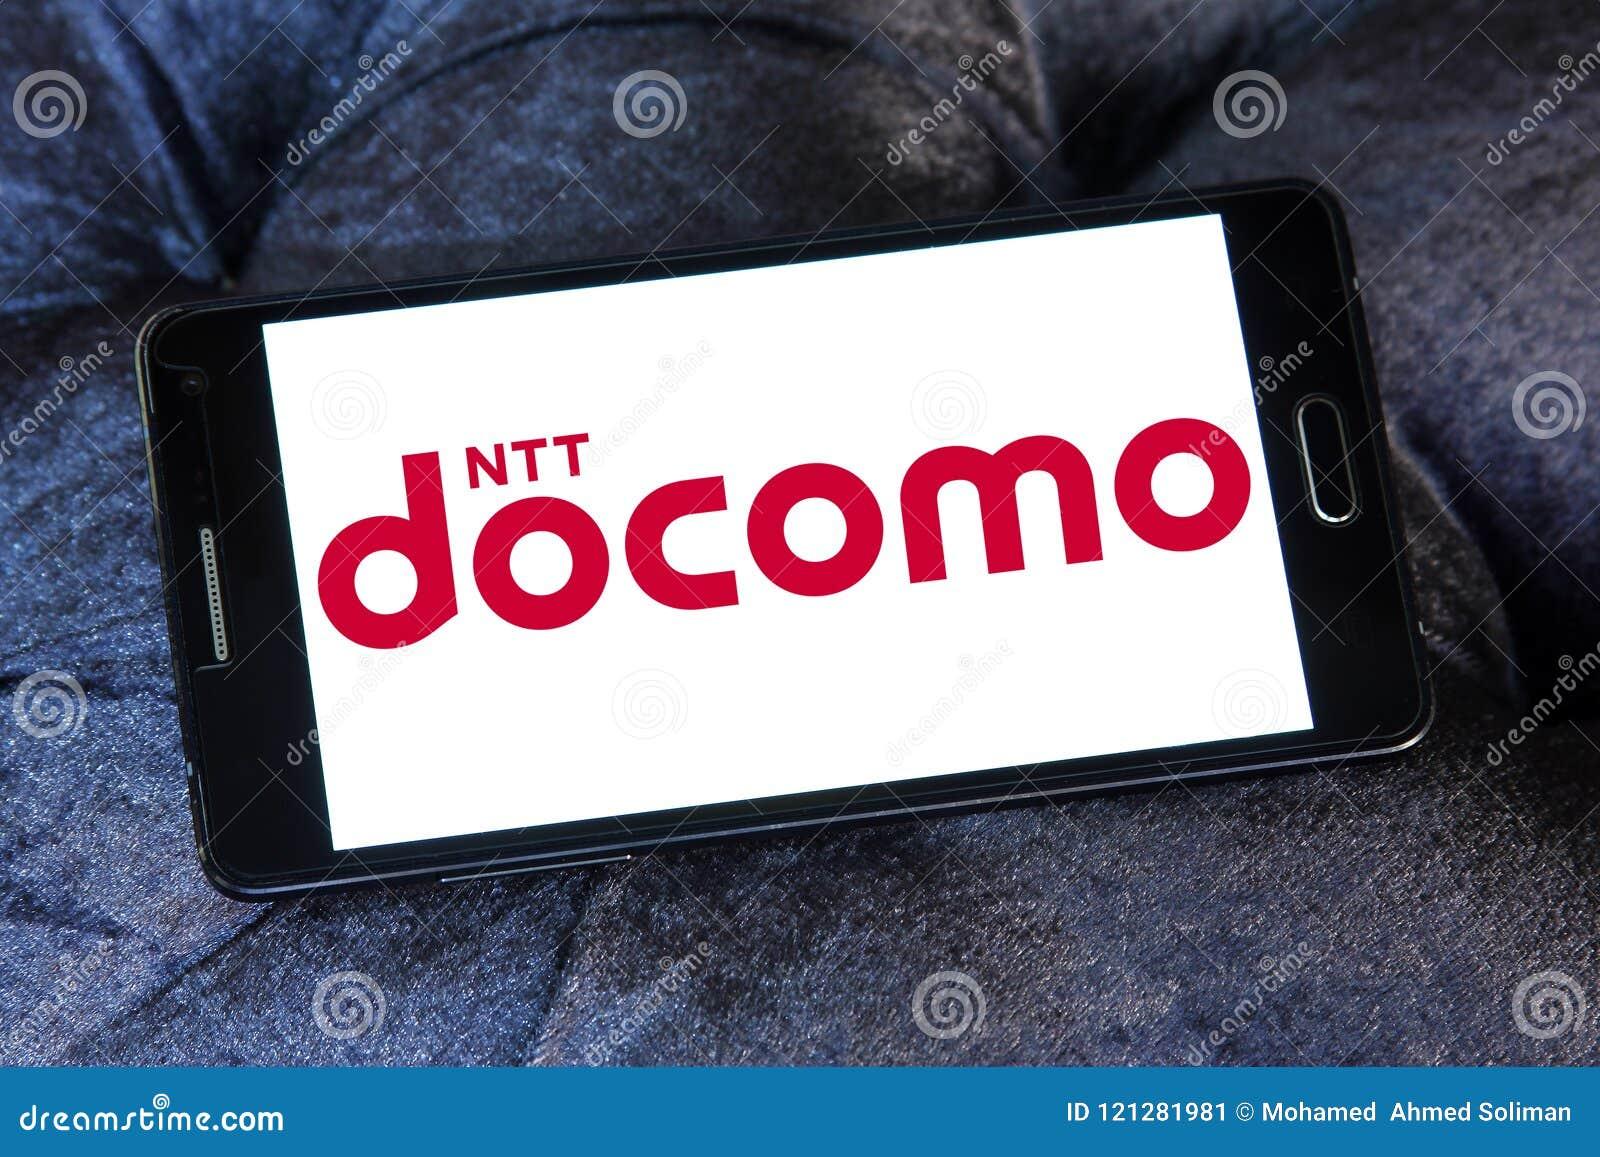 Ntt Docomo Telecommunications Company Logo Editorial Photo Image